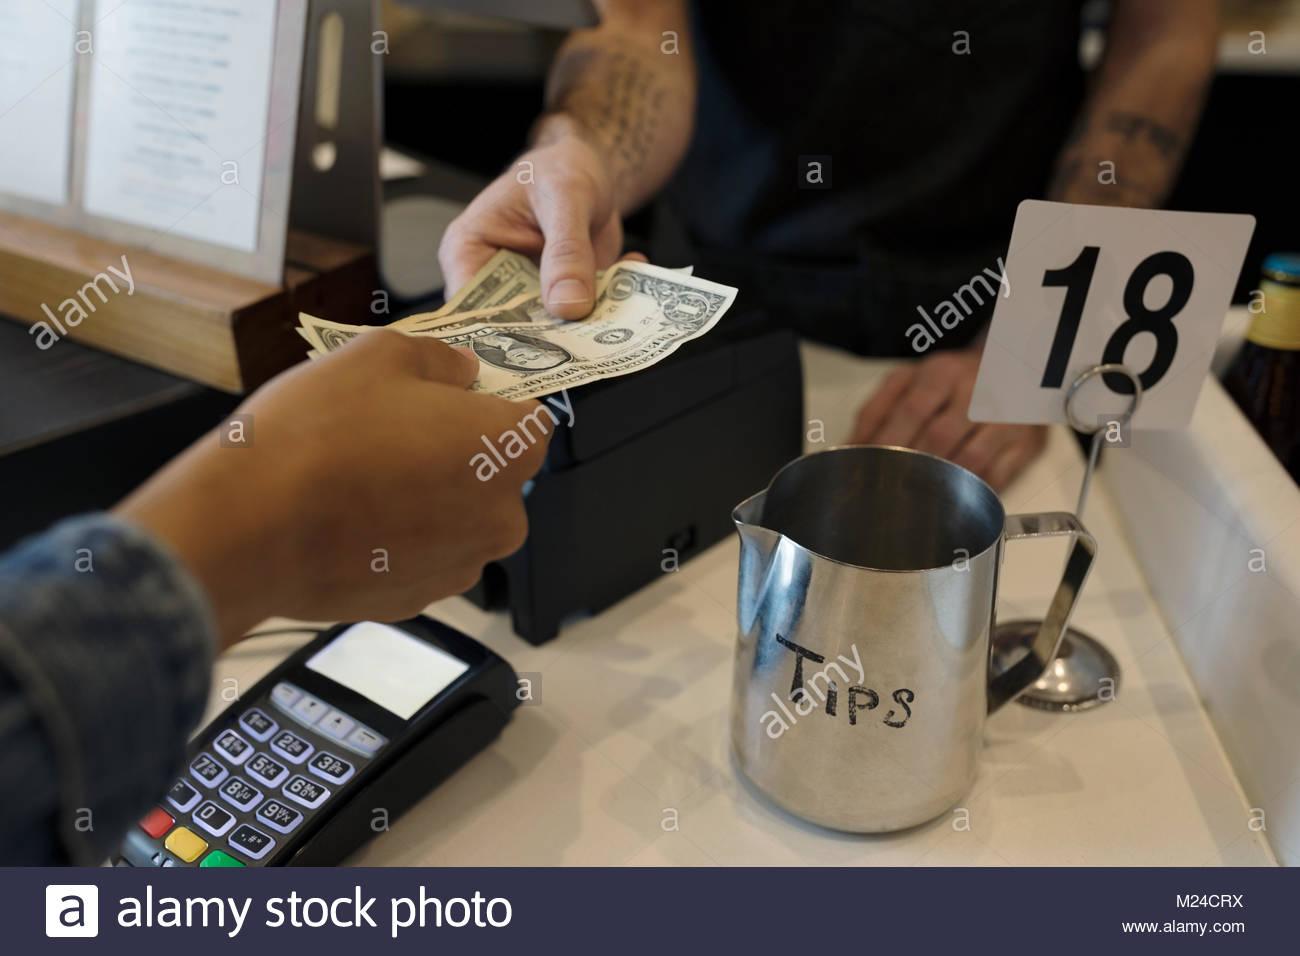 Close up customer paying cashier with cash next to tip jar - Stock Image